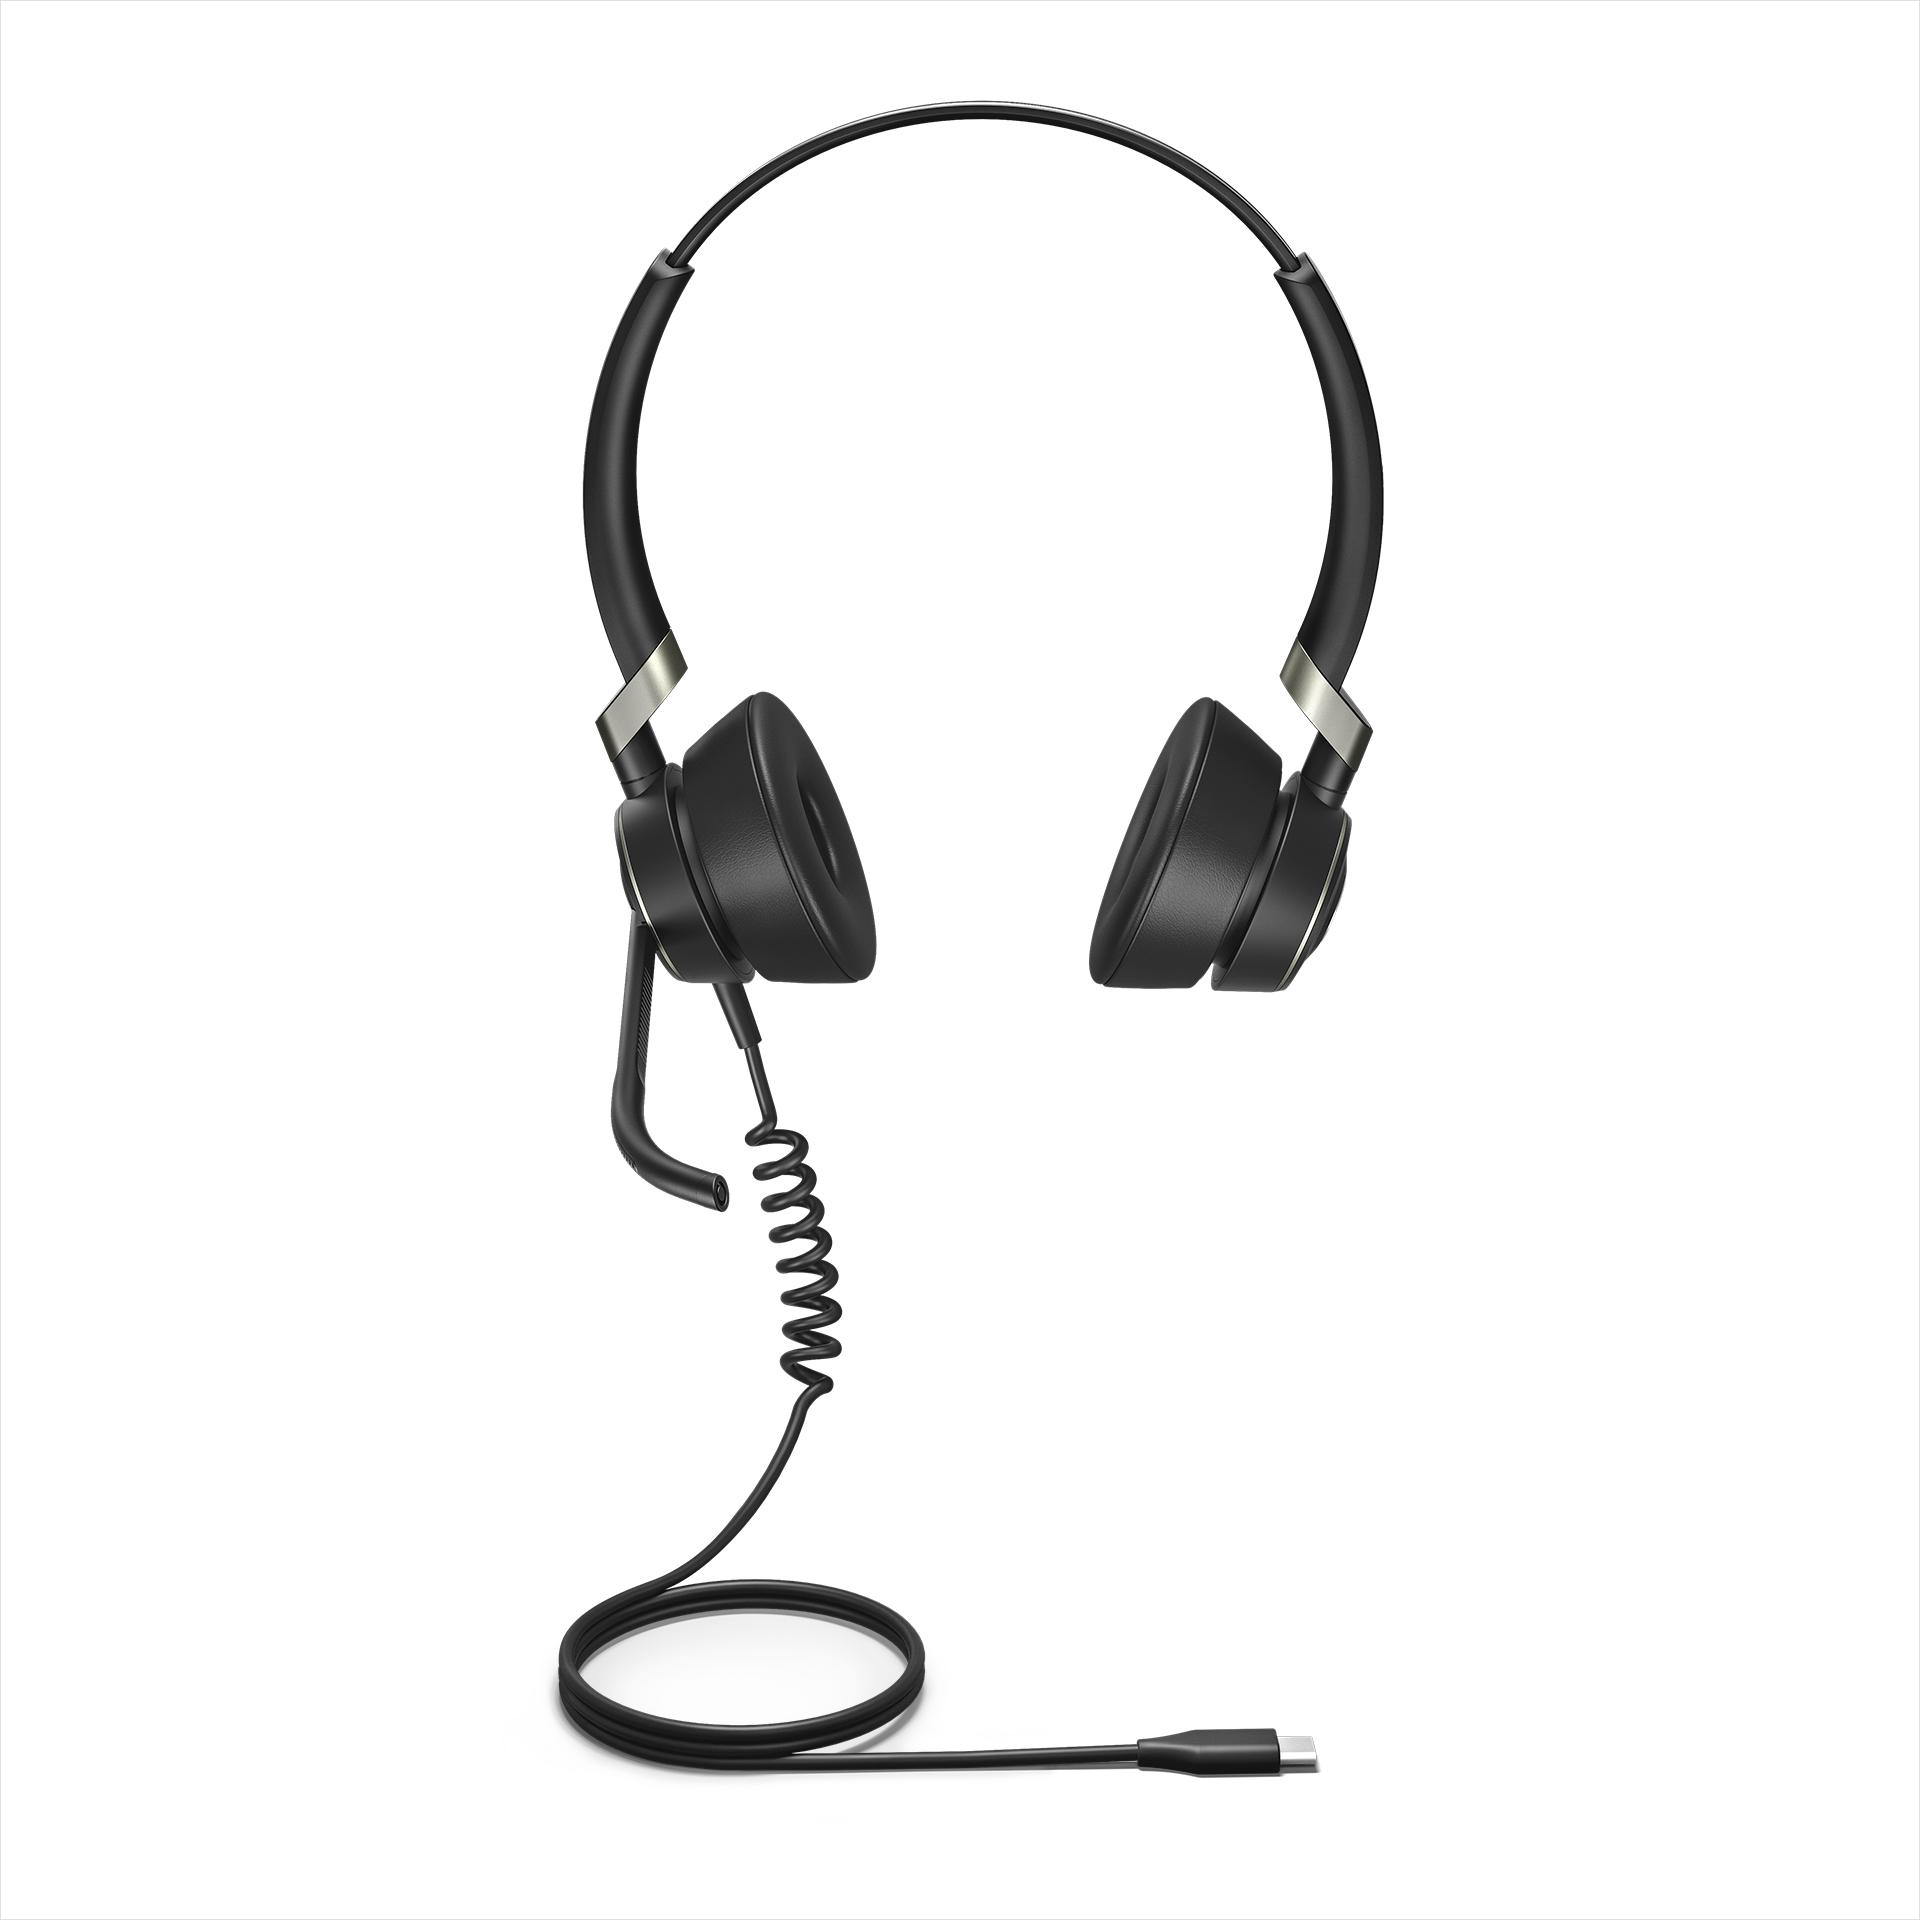 Jabra Engage 50 Stereo Headset